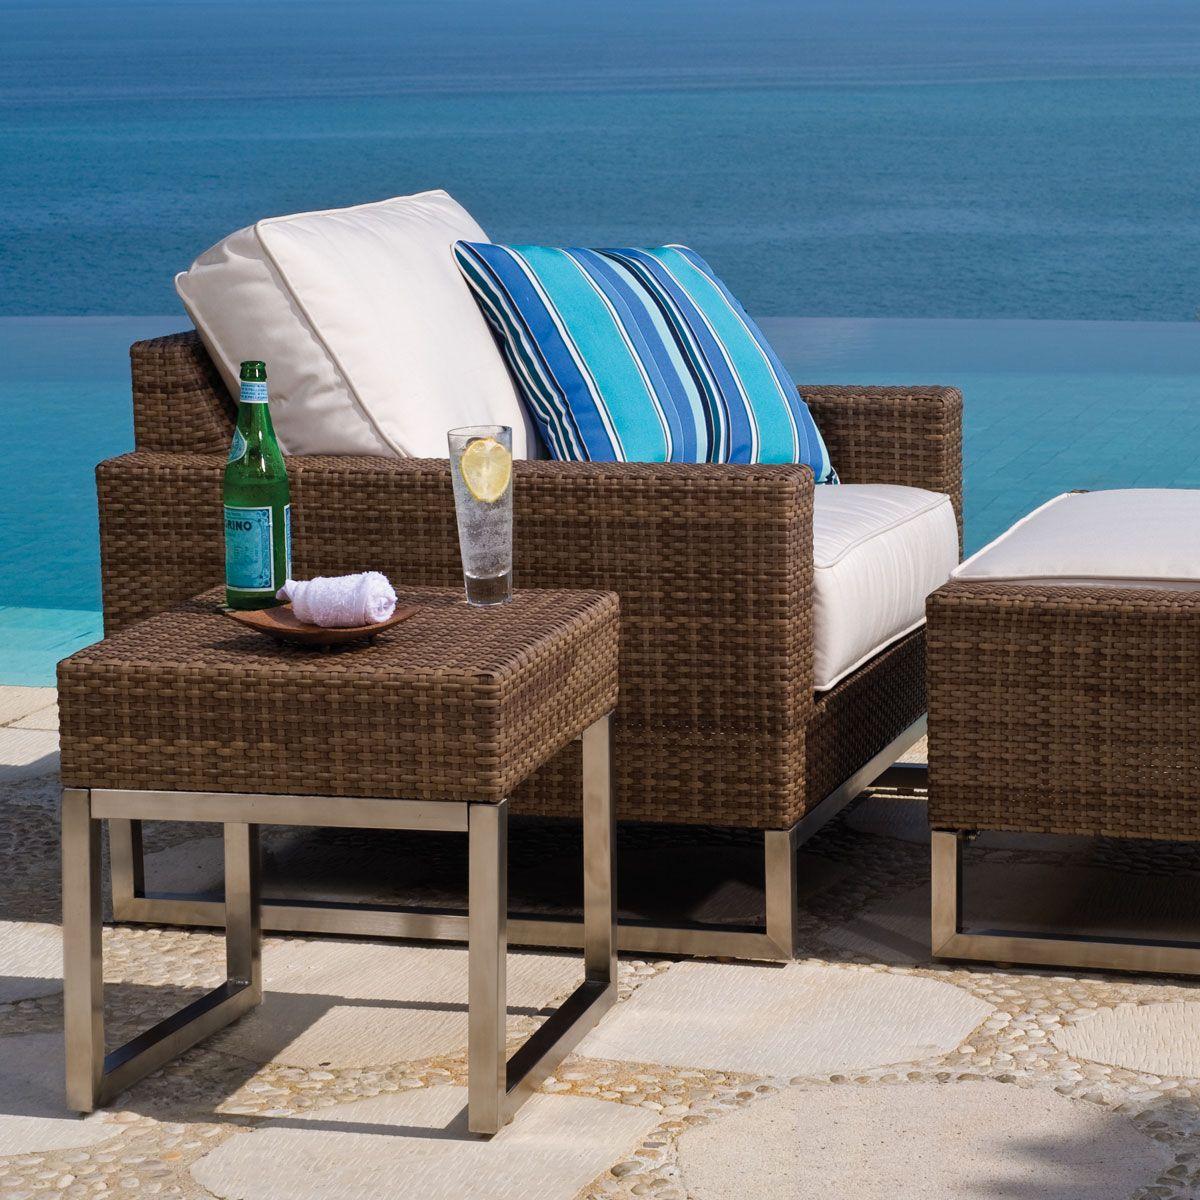 Thos. Baker Palms Wicker Aloha Sesame Cushion Outdoor Club Chair